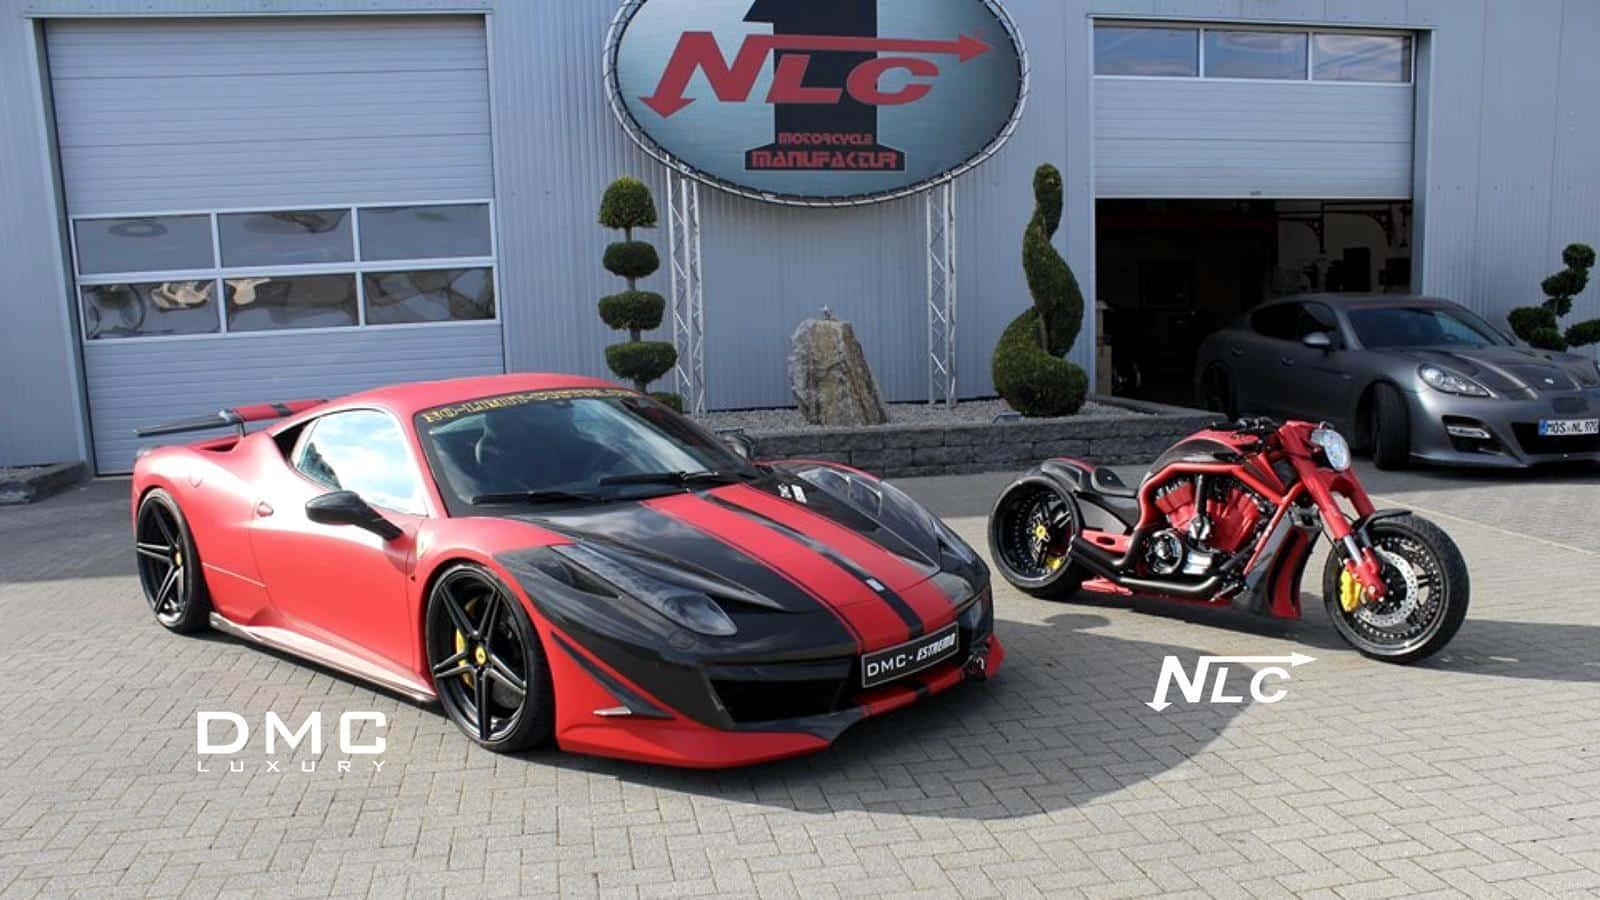 Customized Ferrari 458 Italia And Matching Bike Showcased